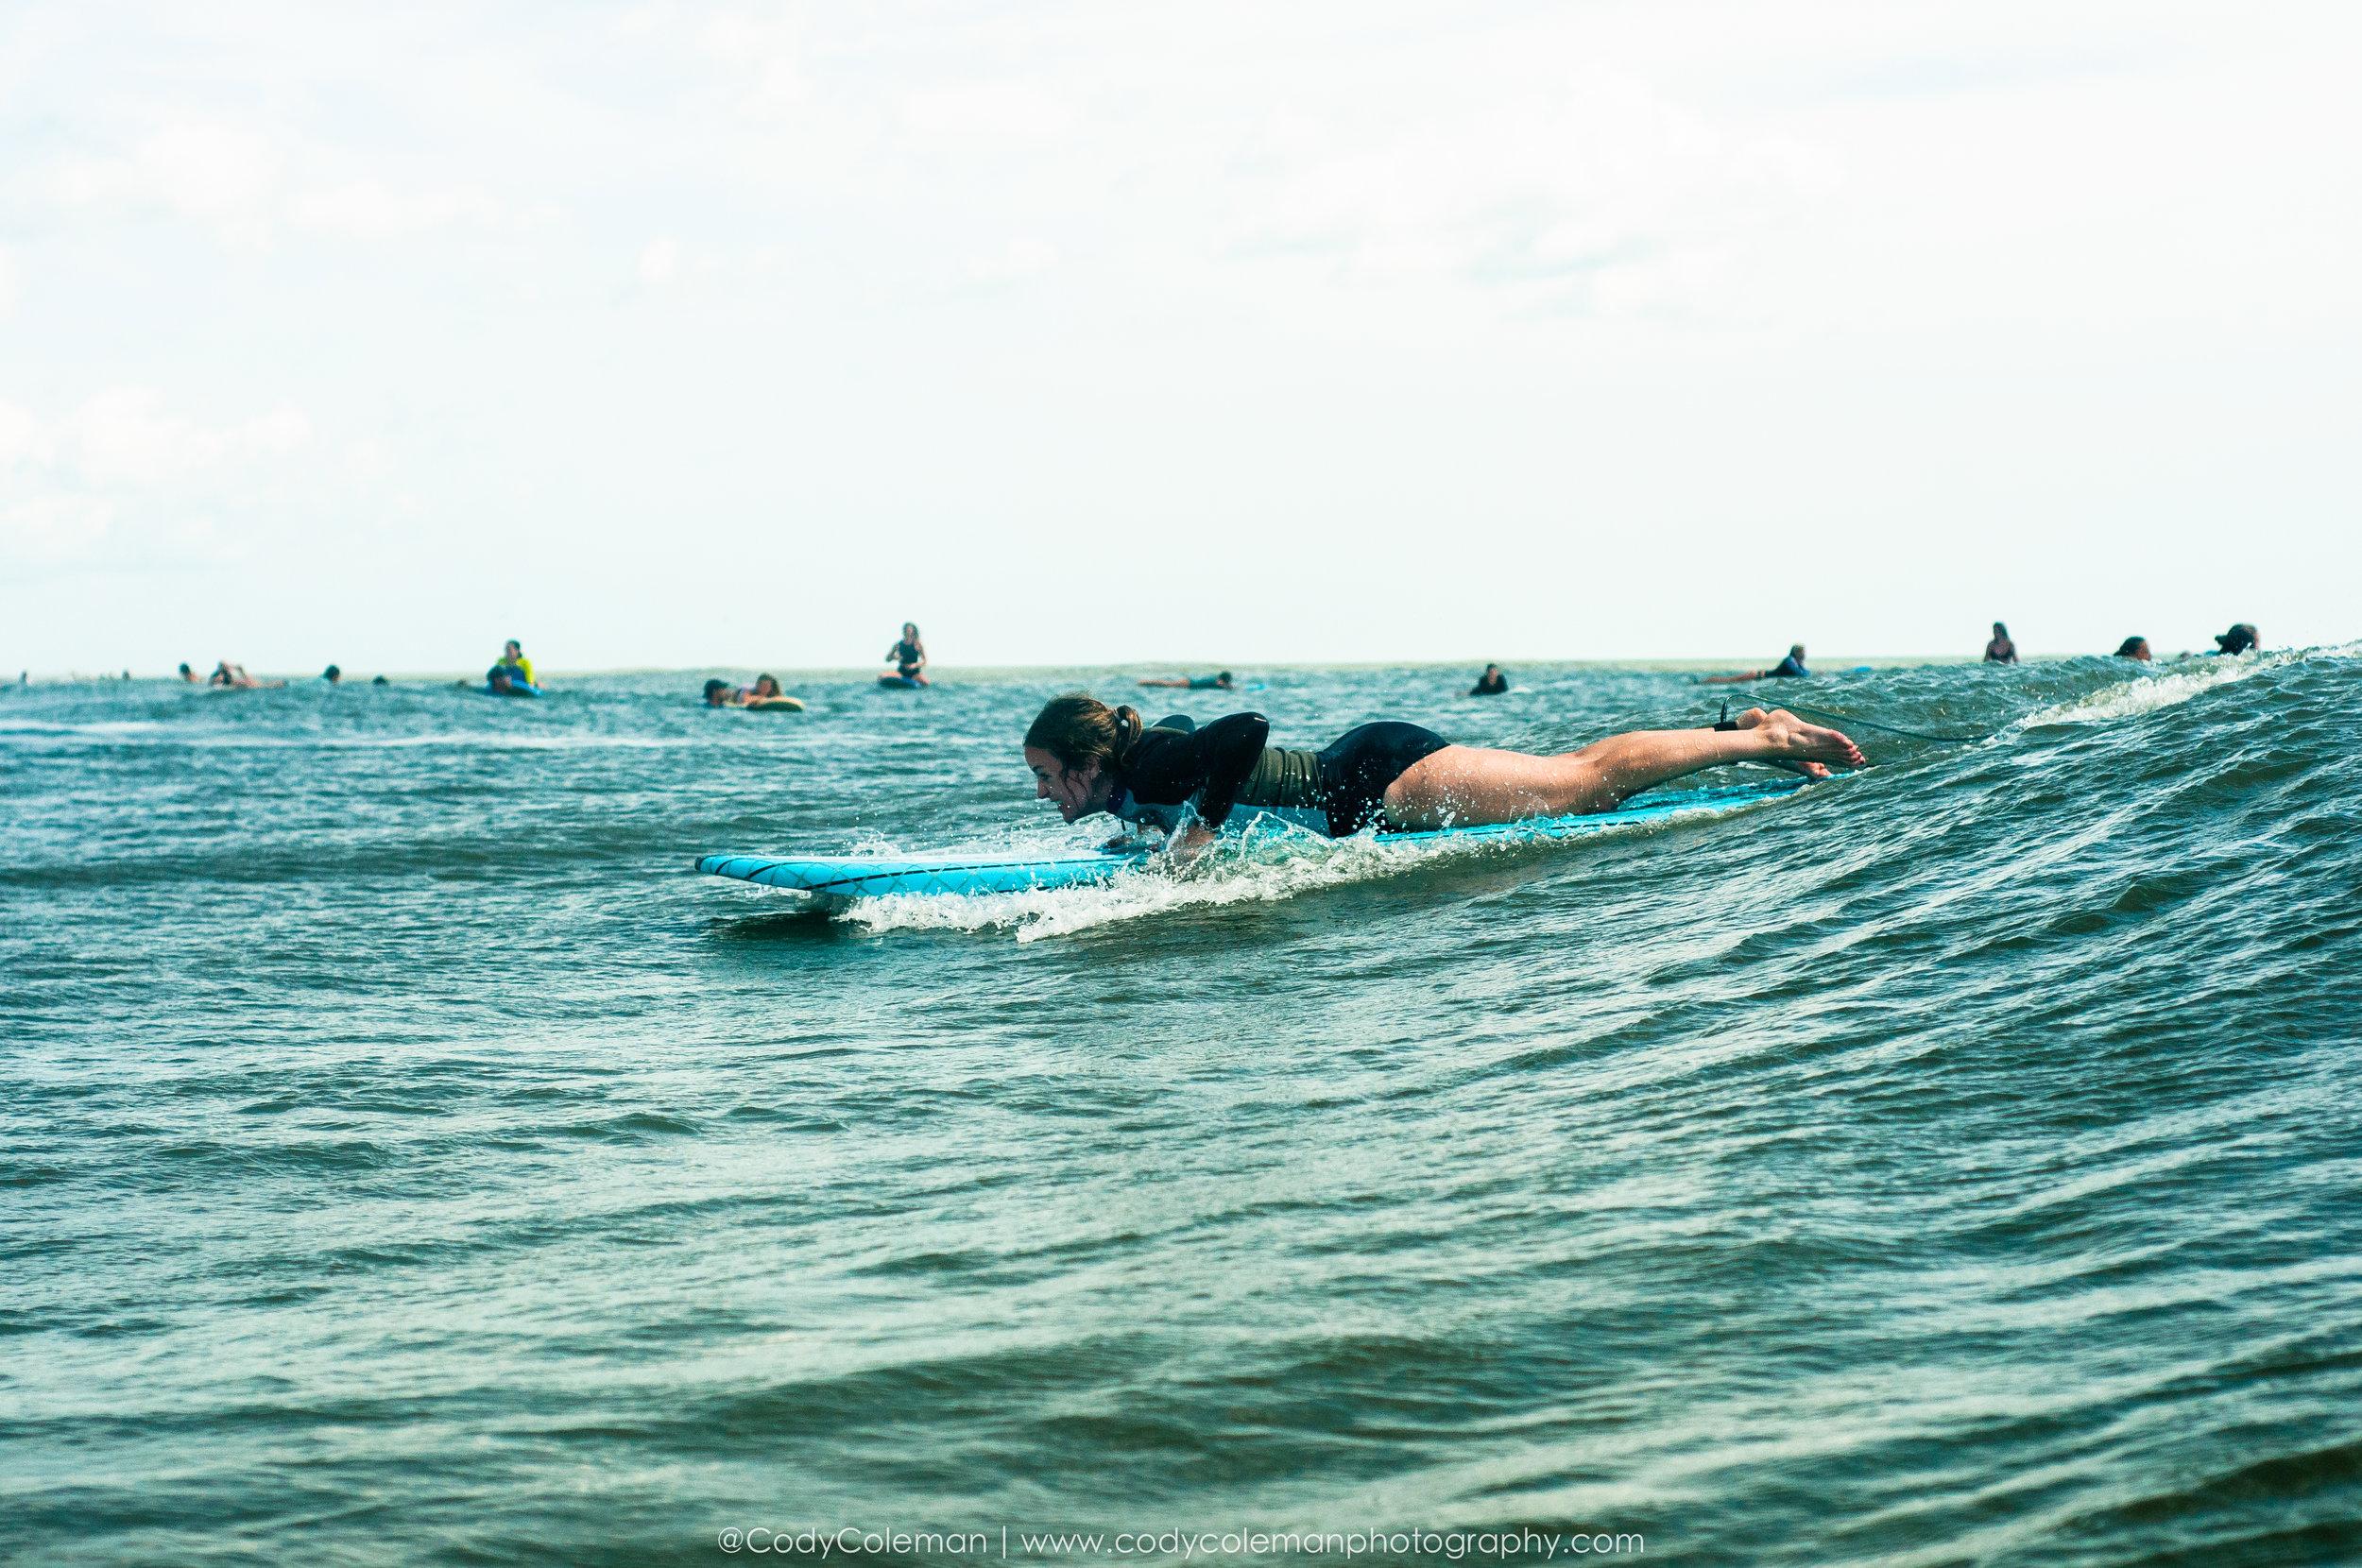 Motherday_SurfCamp_PHOTO_COLEMAN-304.jpg